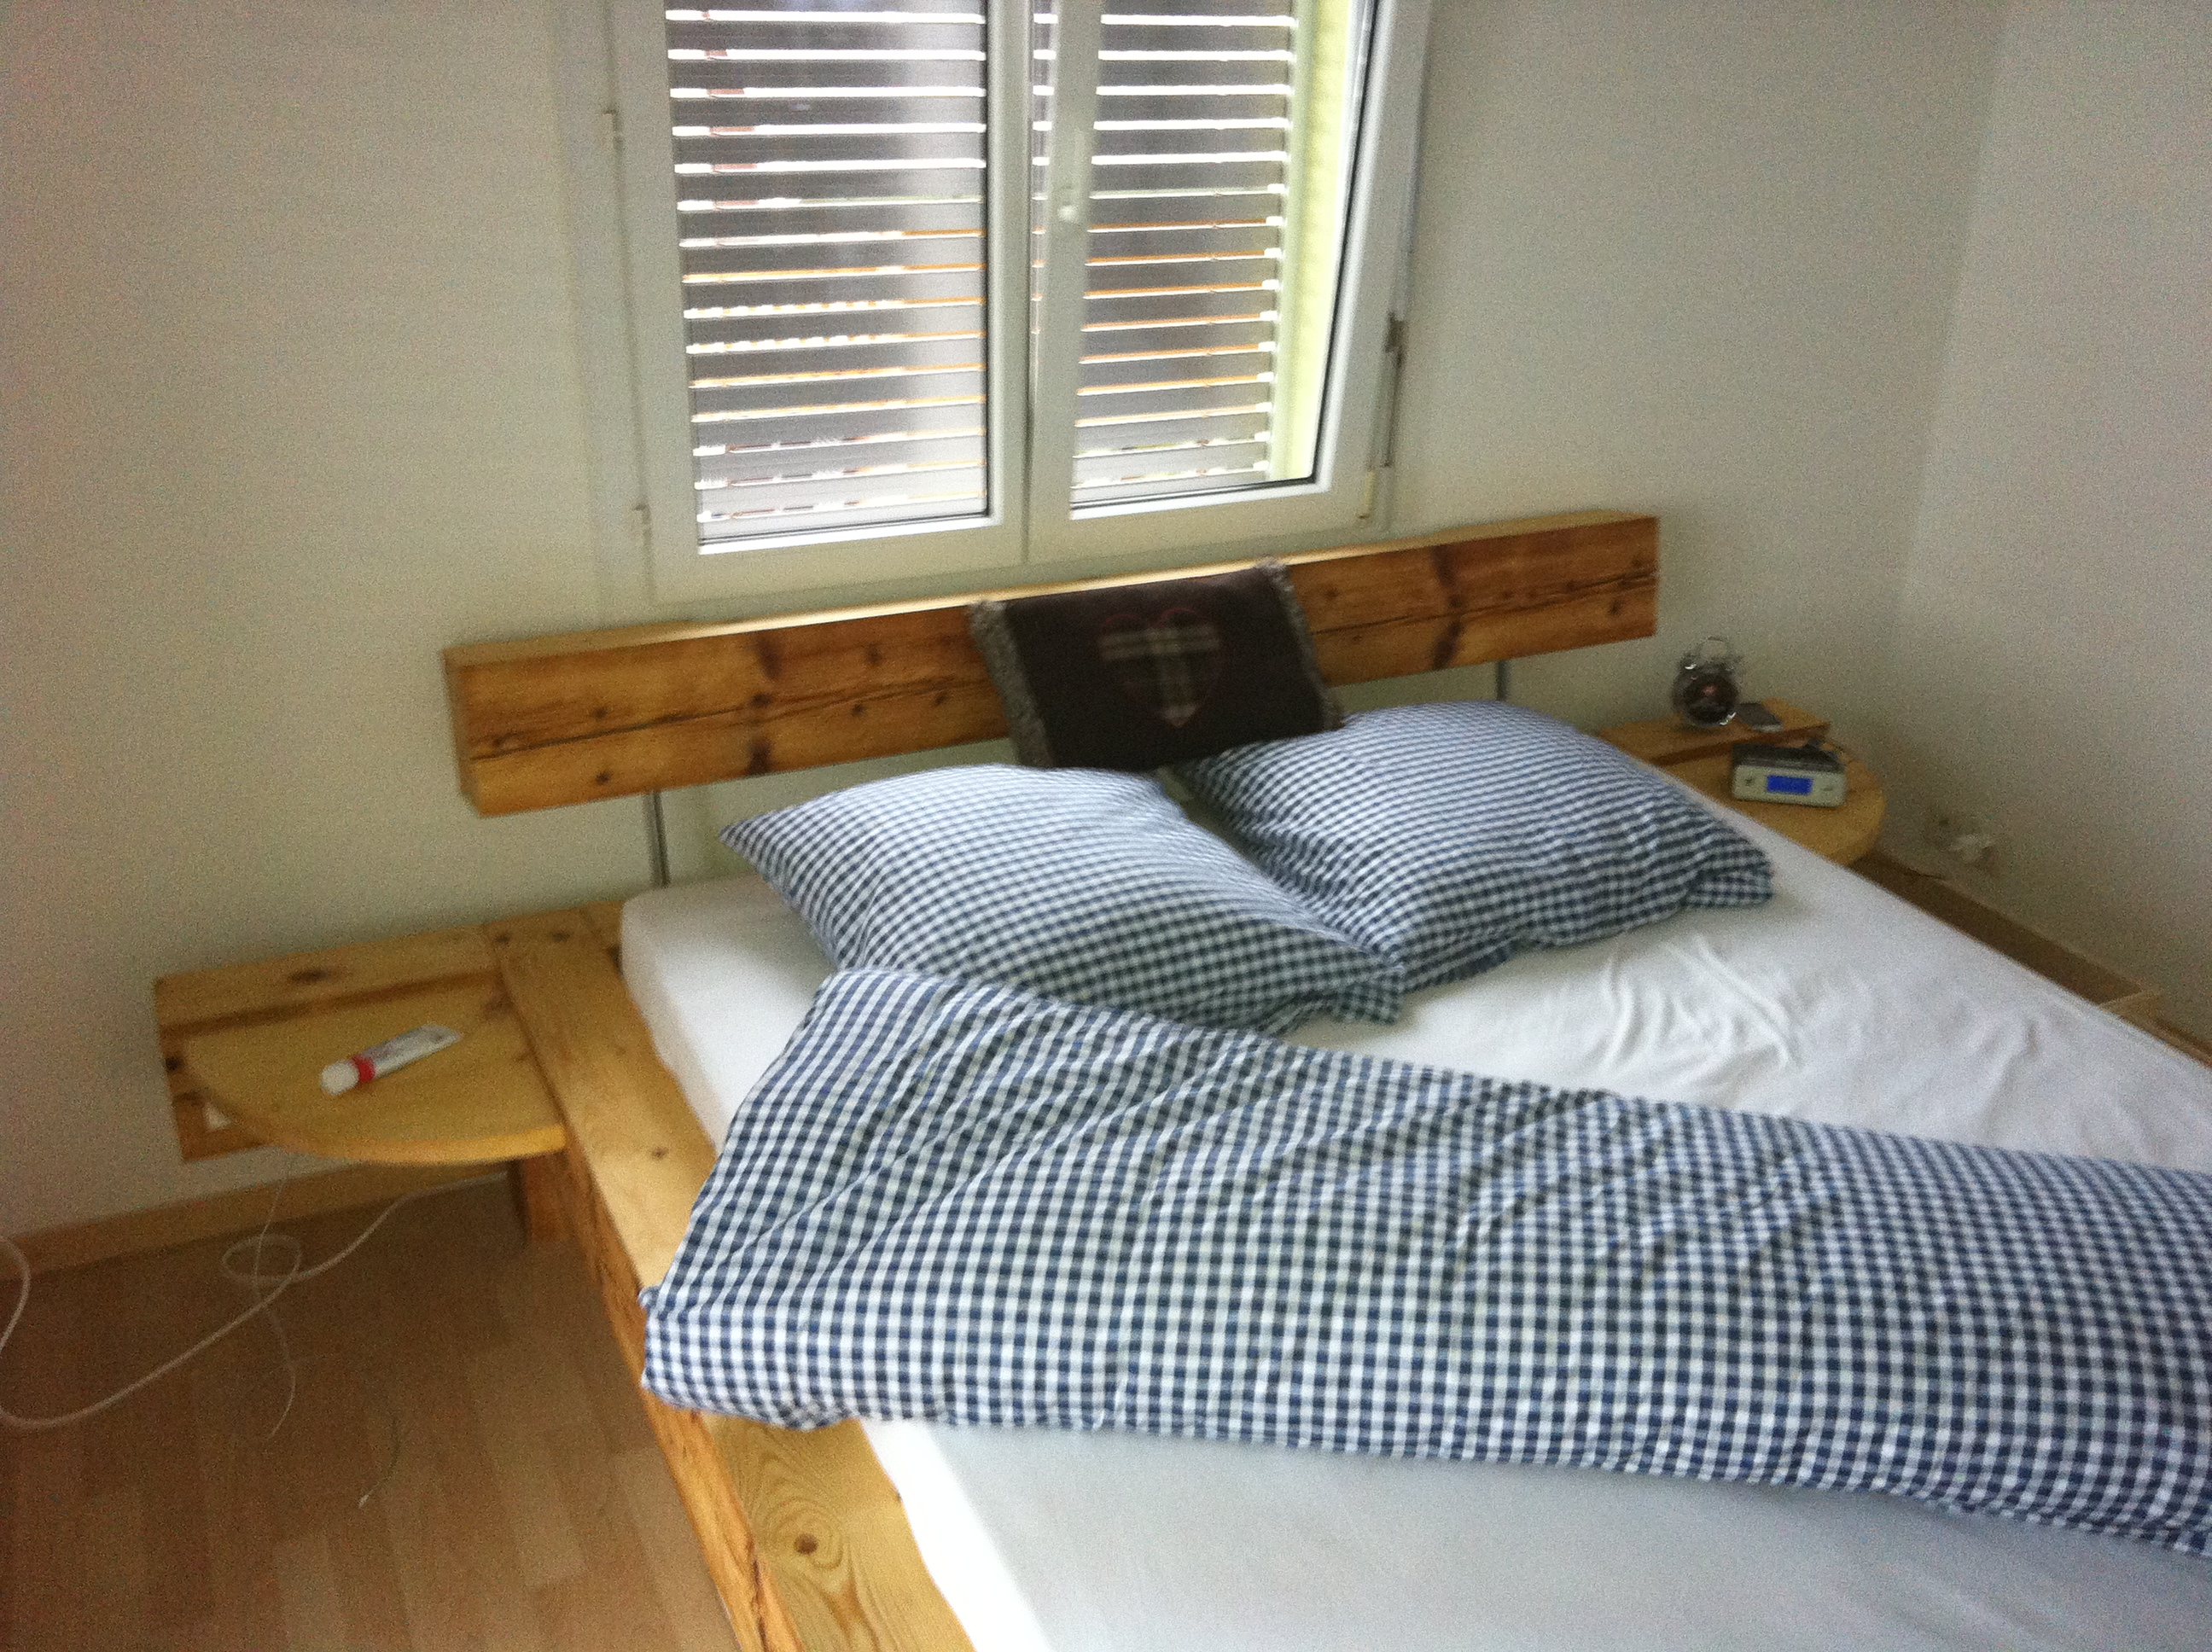 sassi holzbau galerie spezielles bett aus altholz. Black Bedroom Furniture Sets. Home Design Ideas